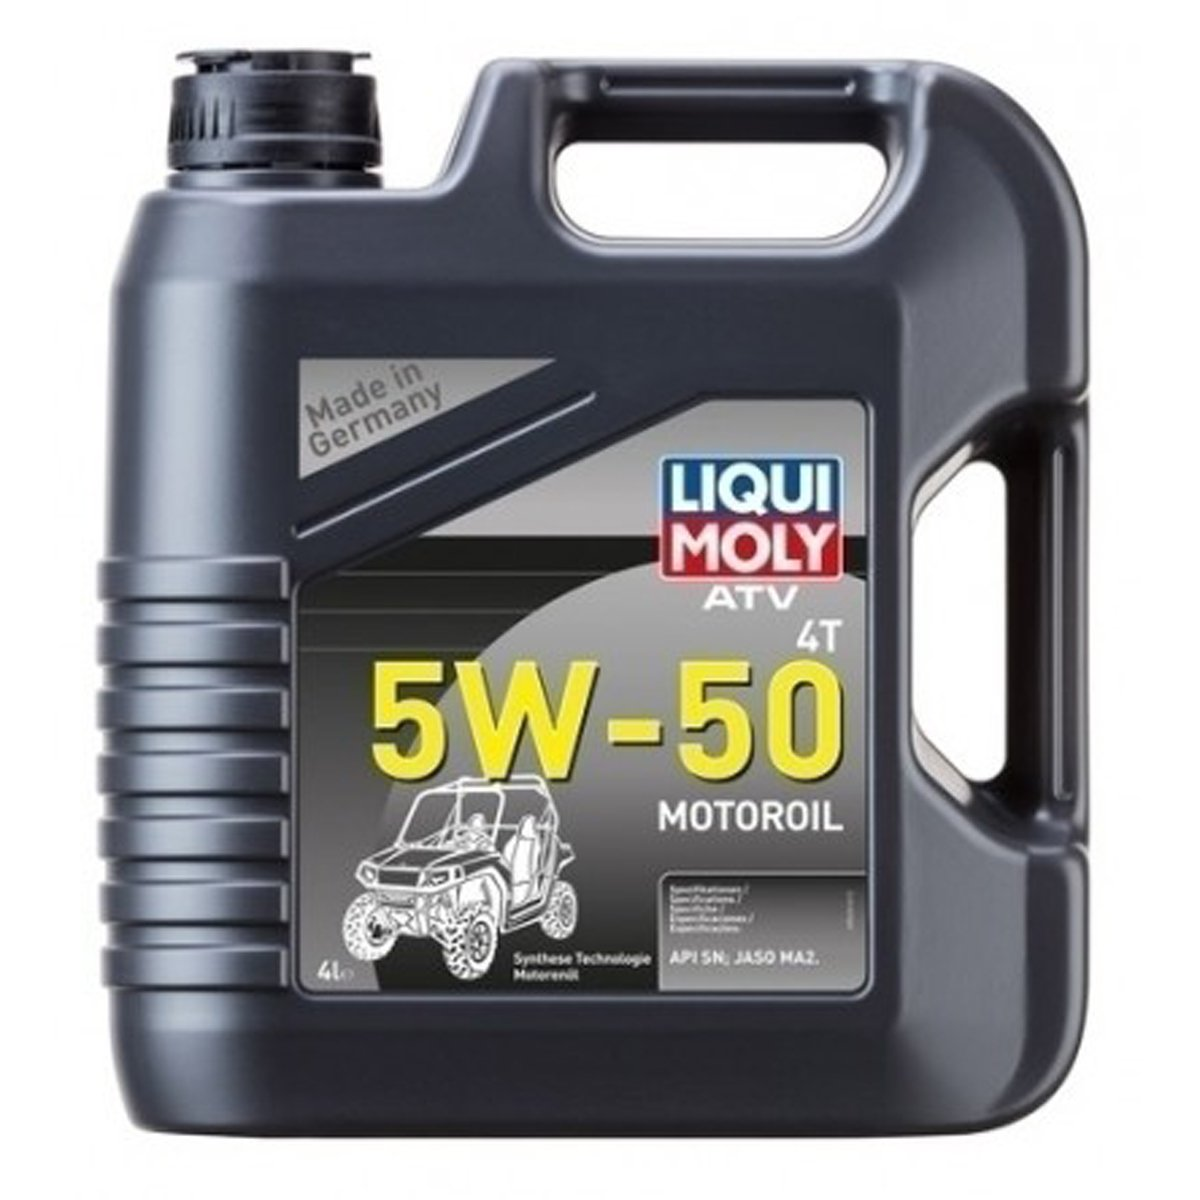 Liqui Moly 20214 LIQUI MOLY ATV/UTV 4T 5W50 4L